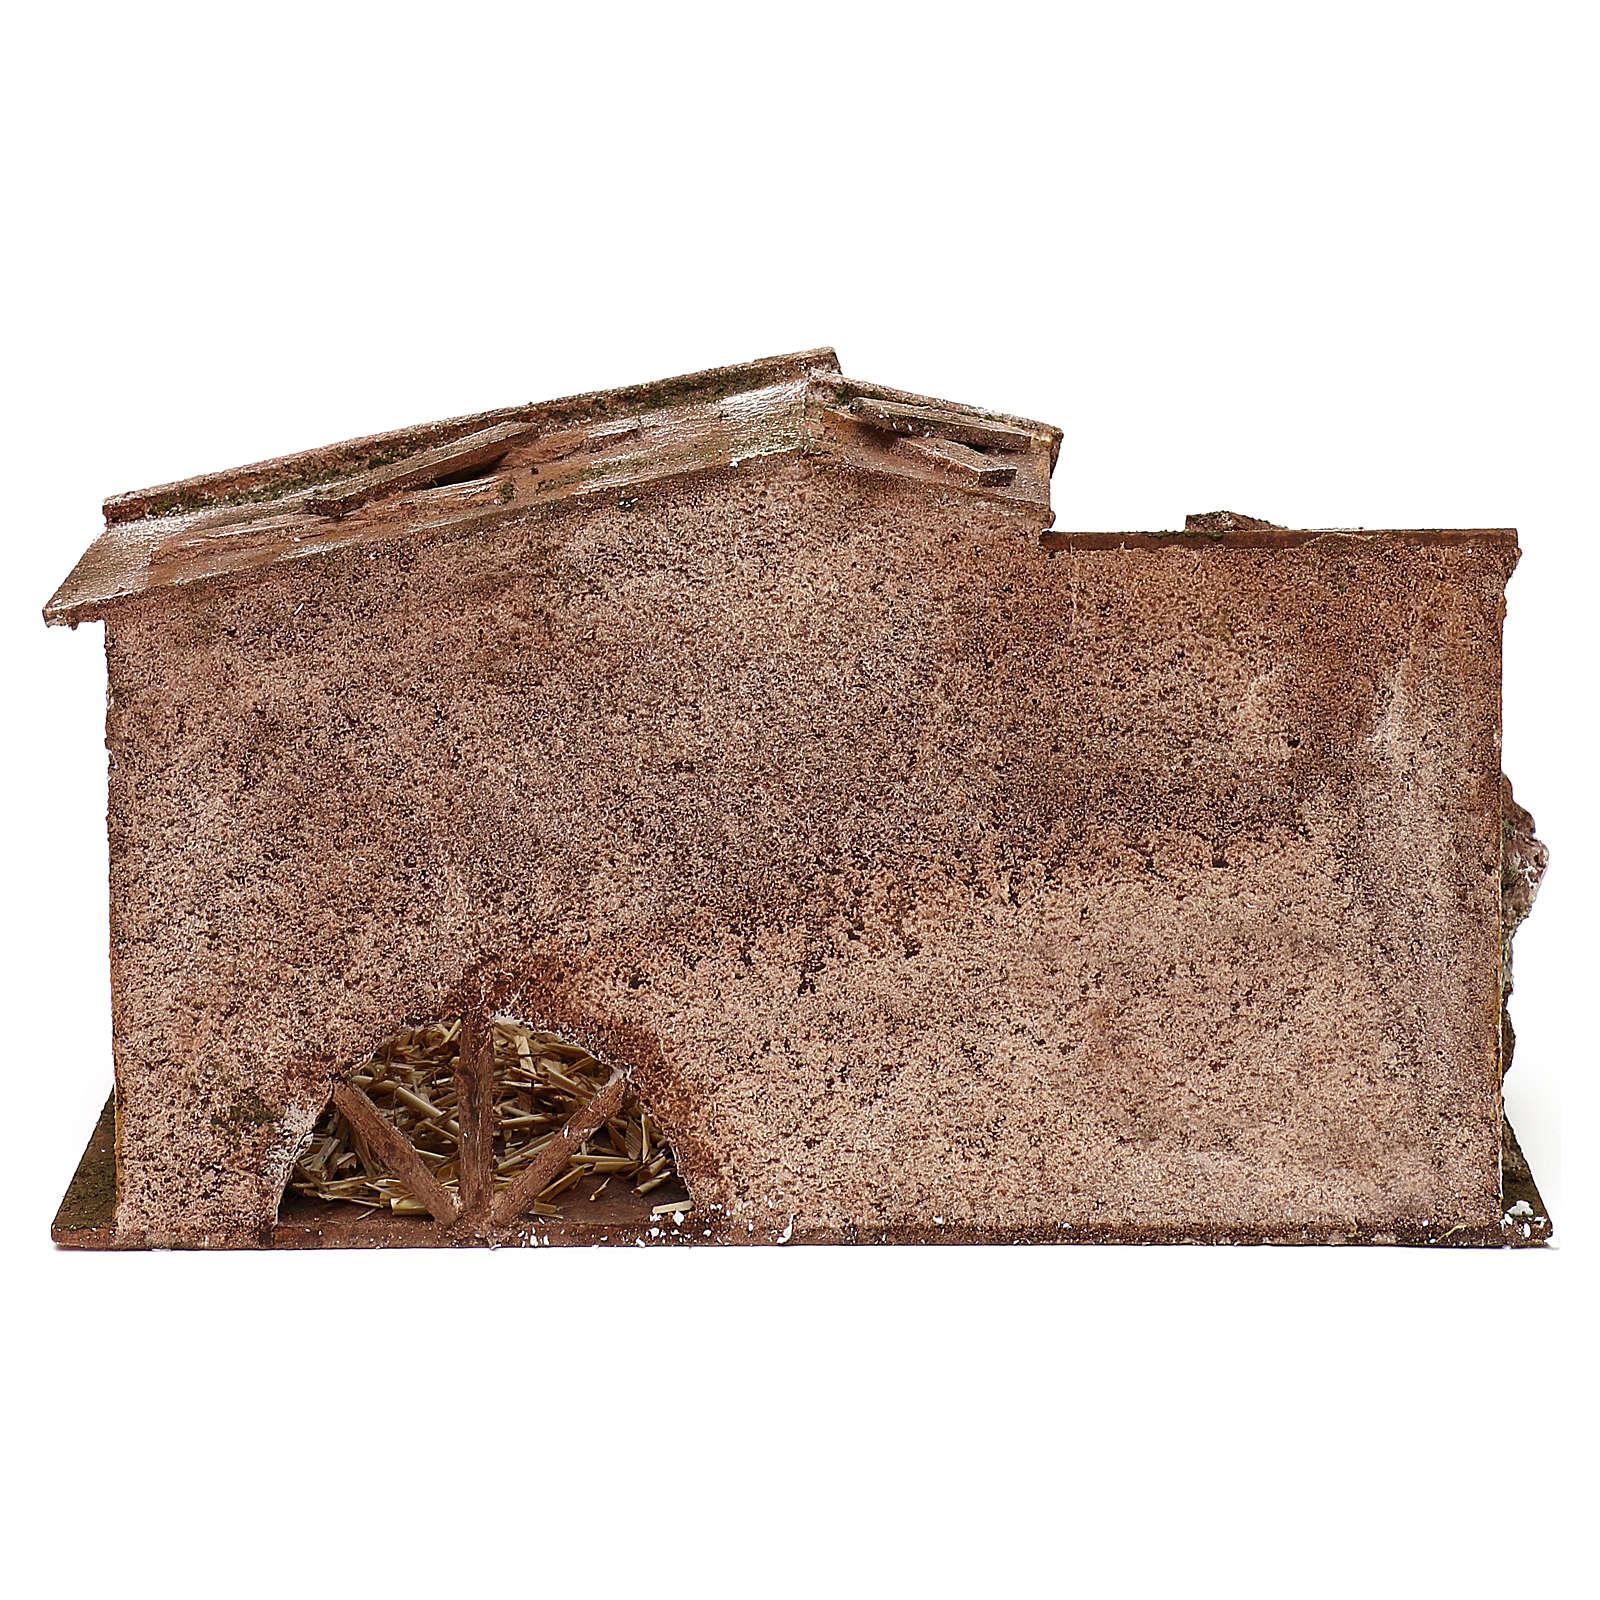 Capanna paglia e fienile presepe 20x35x20 cm per presepi di 12 cm 4